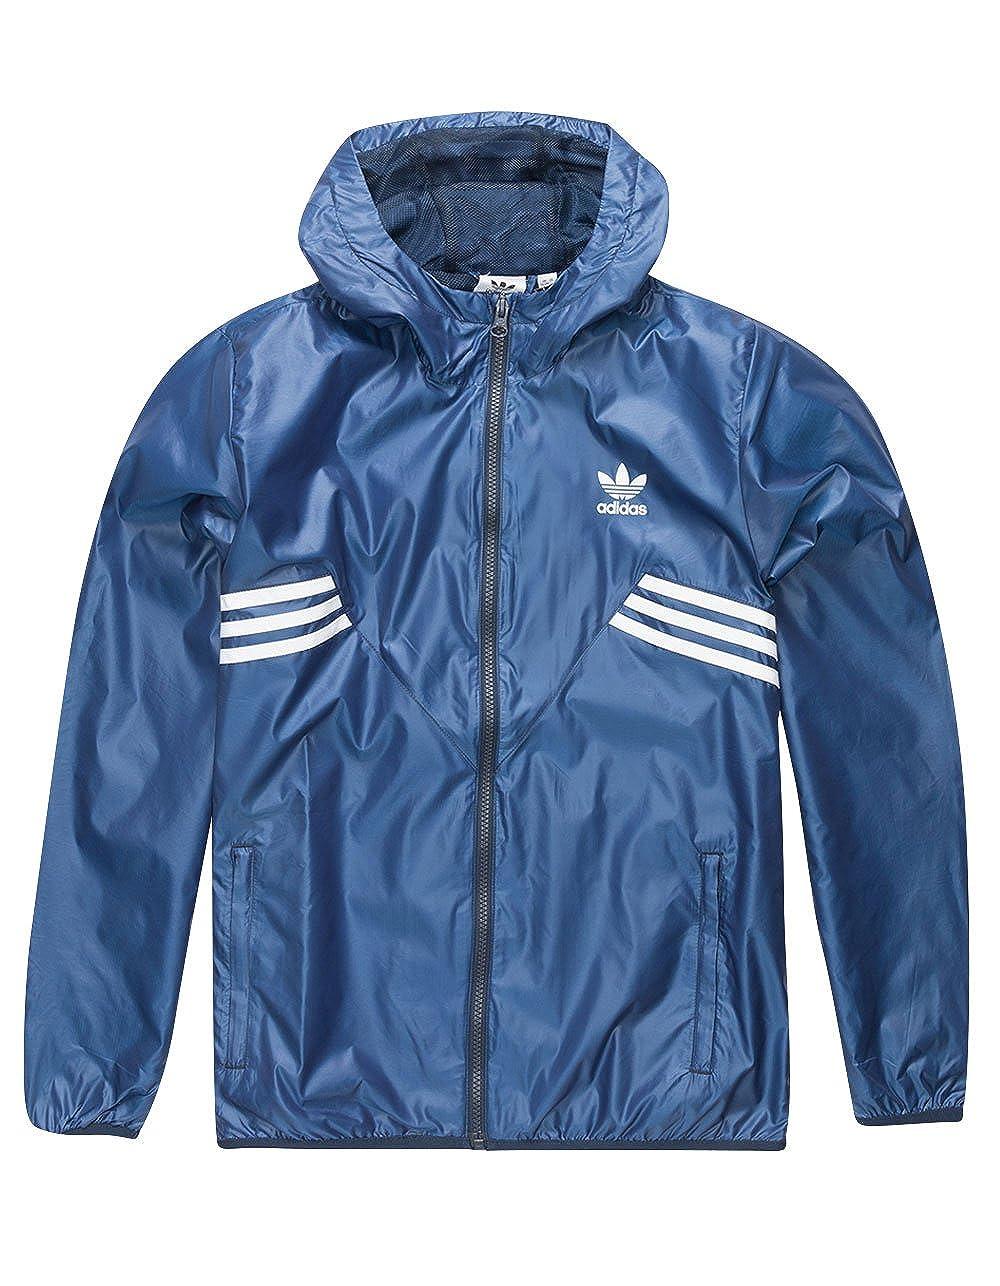 0676ea85605 Top 10 wholesale Adidas Zip Up Windbreaker. Wholesale clothing